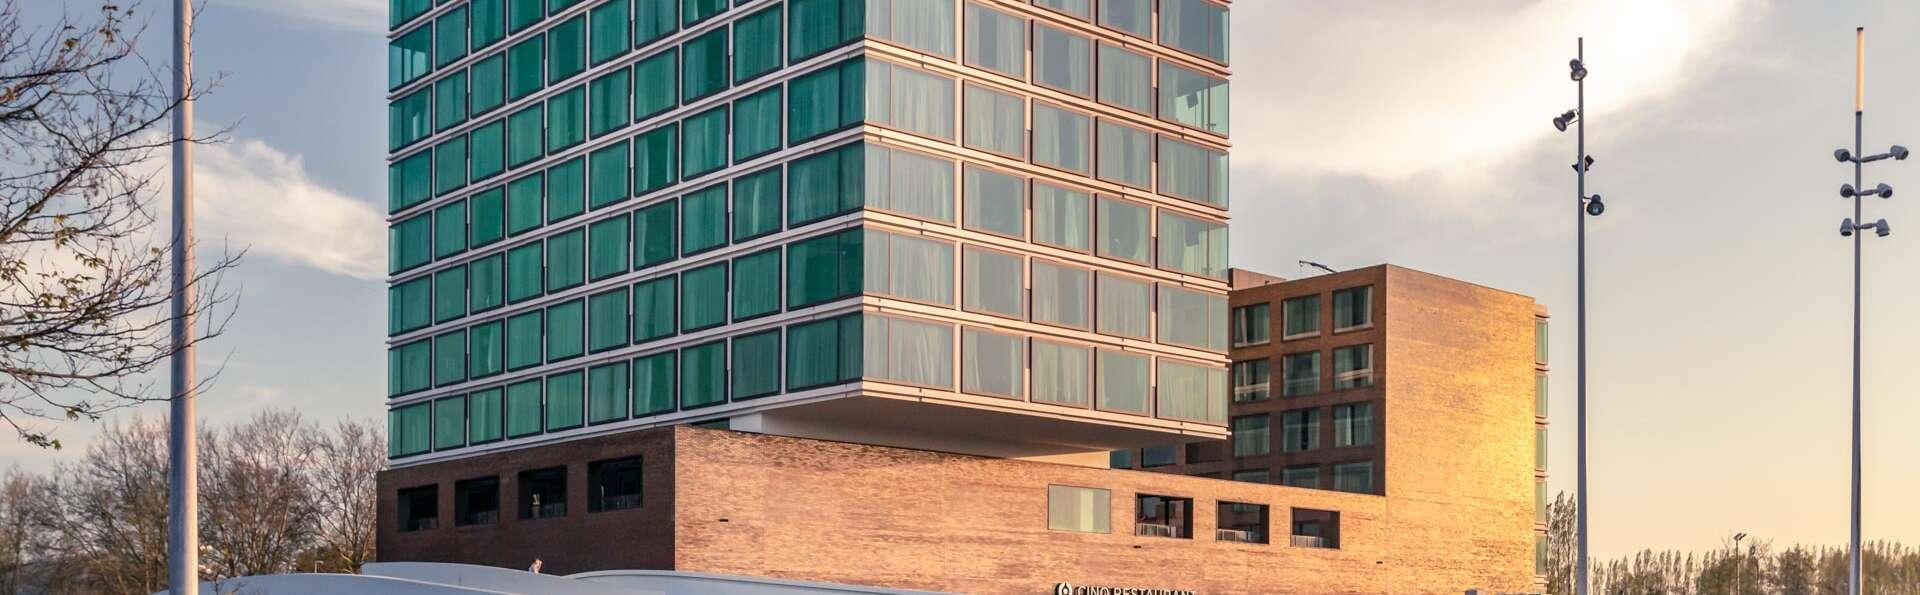 Olympic Hotel  - EDIT_FRONT_06.jpg